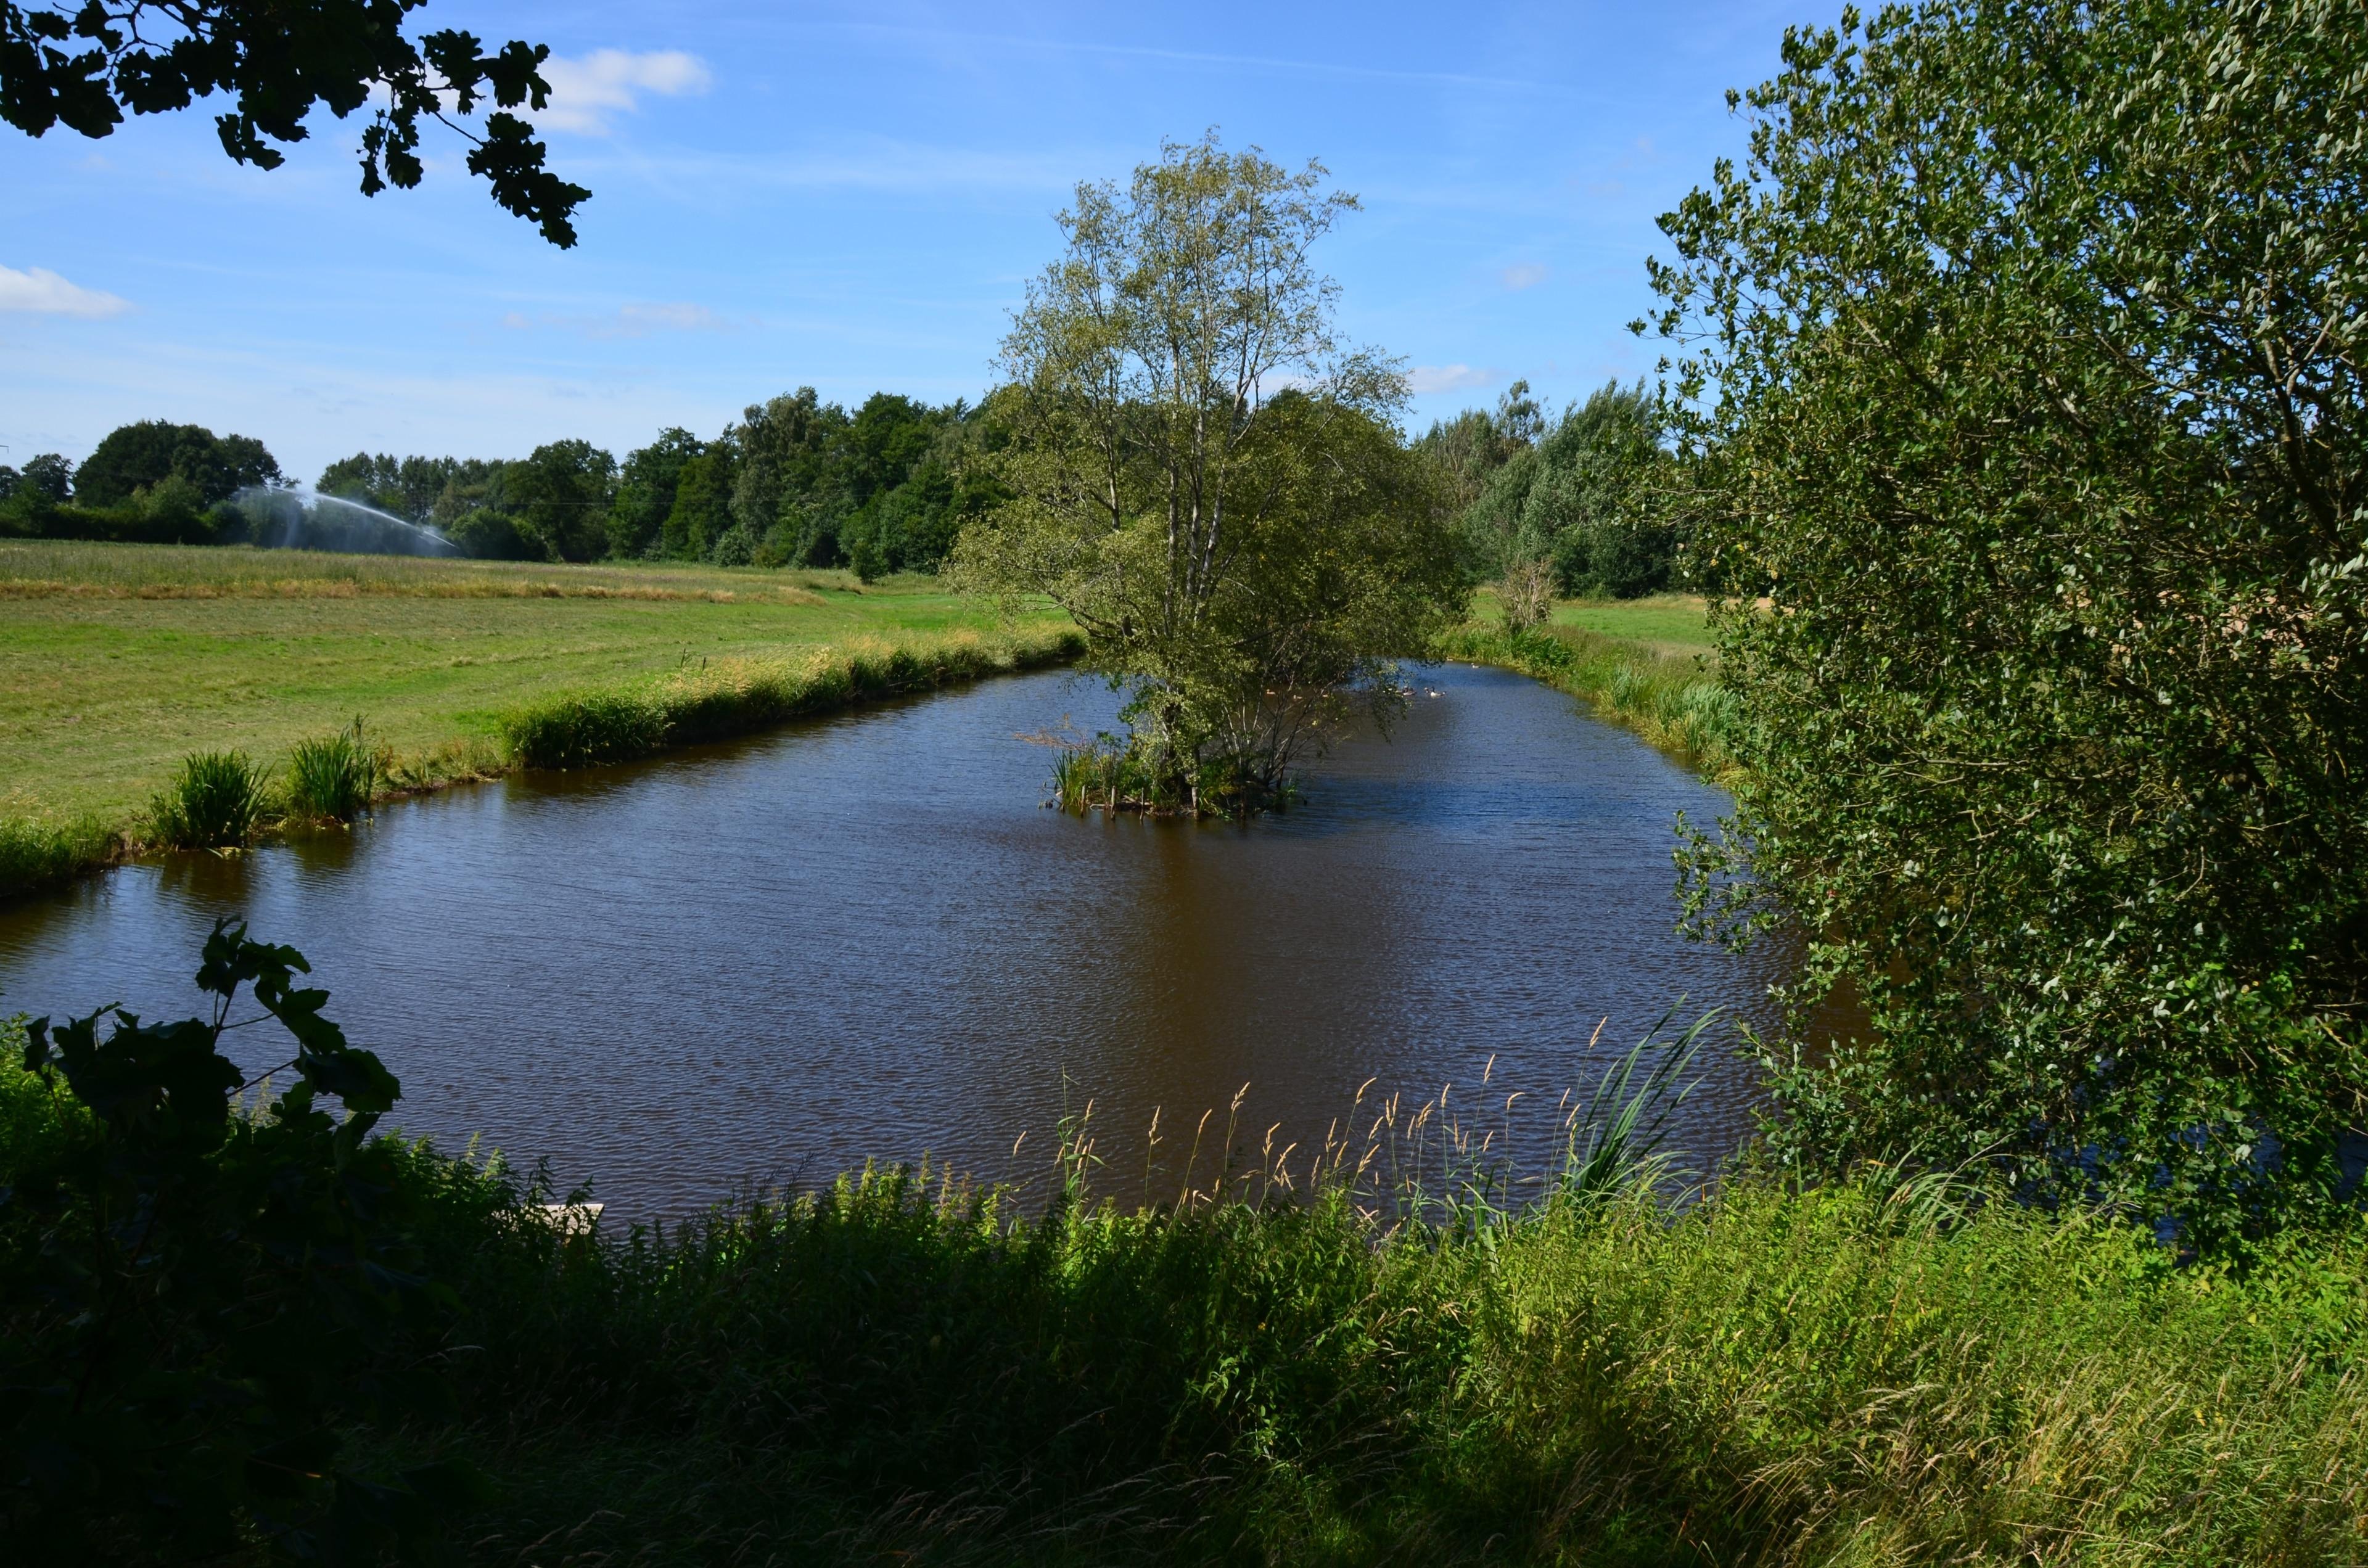 Lohbarbek, Schleswig-Holstein, Germany